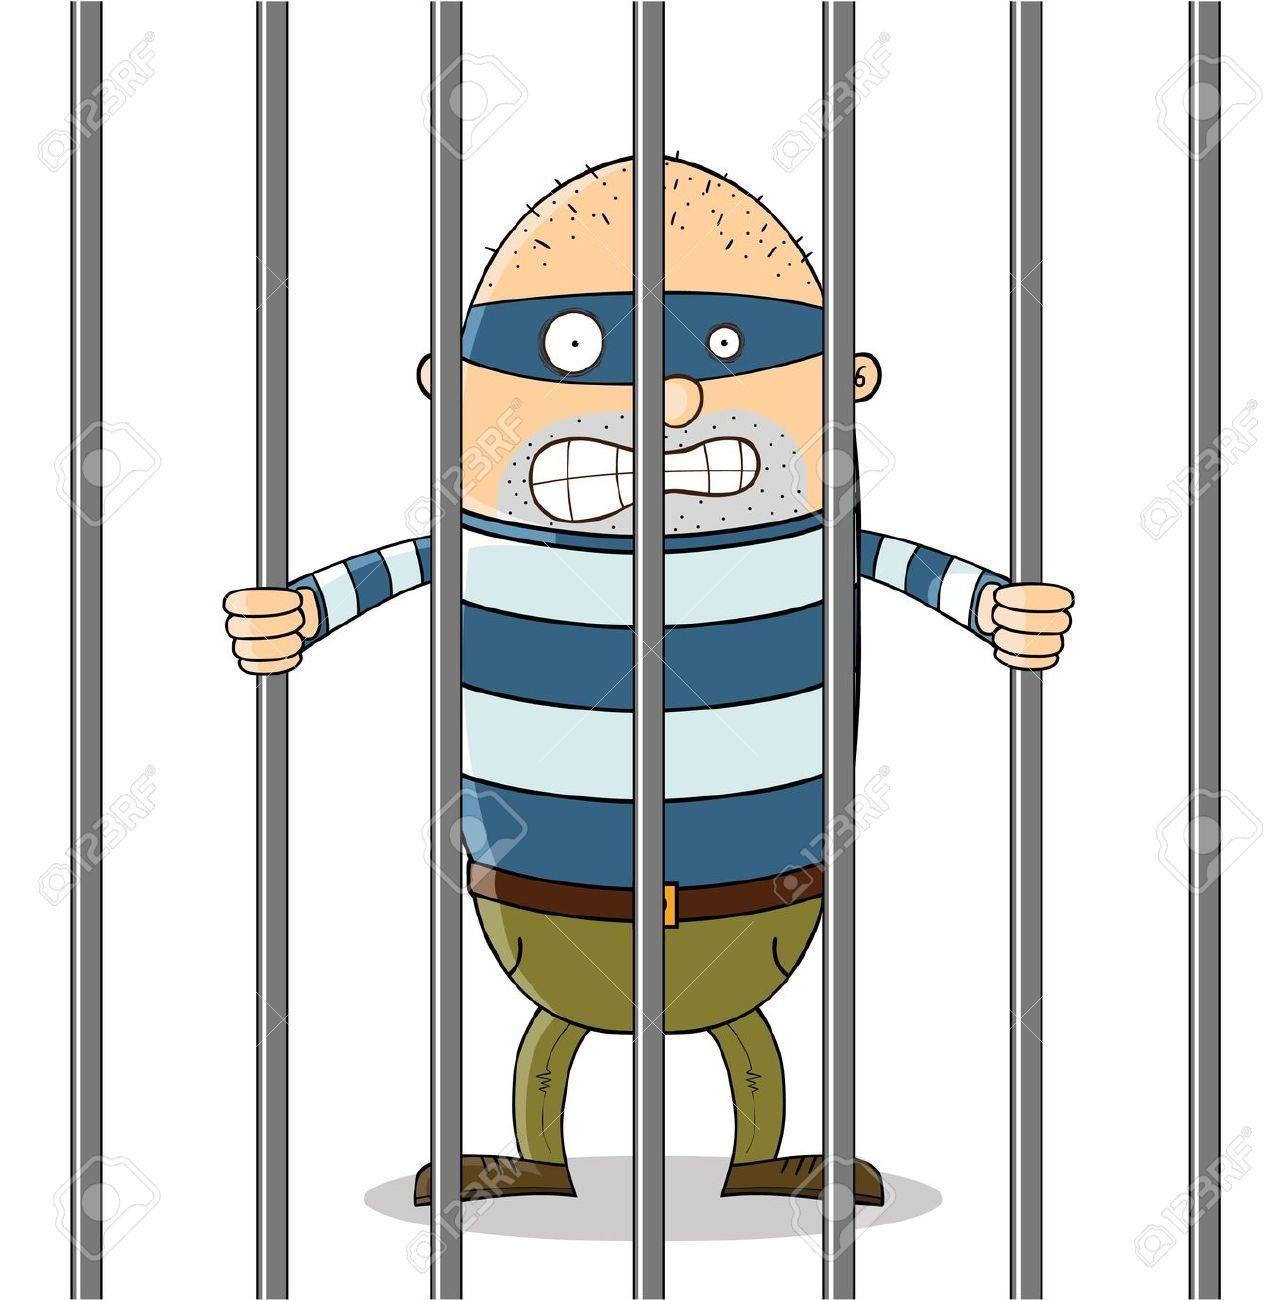 Clipart prison 6 » Clipart Portal.